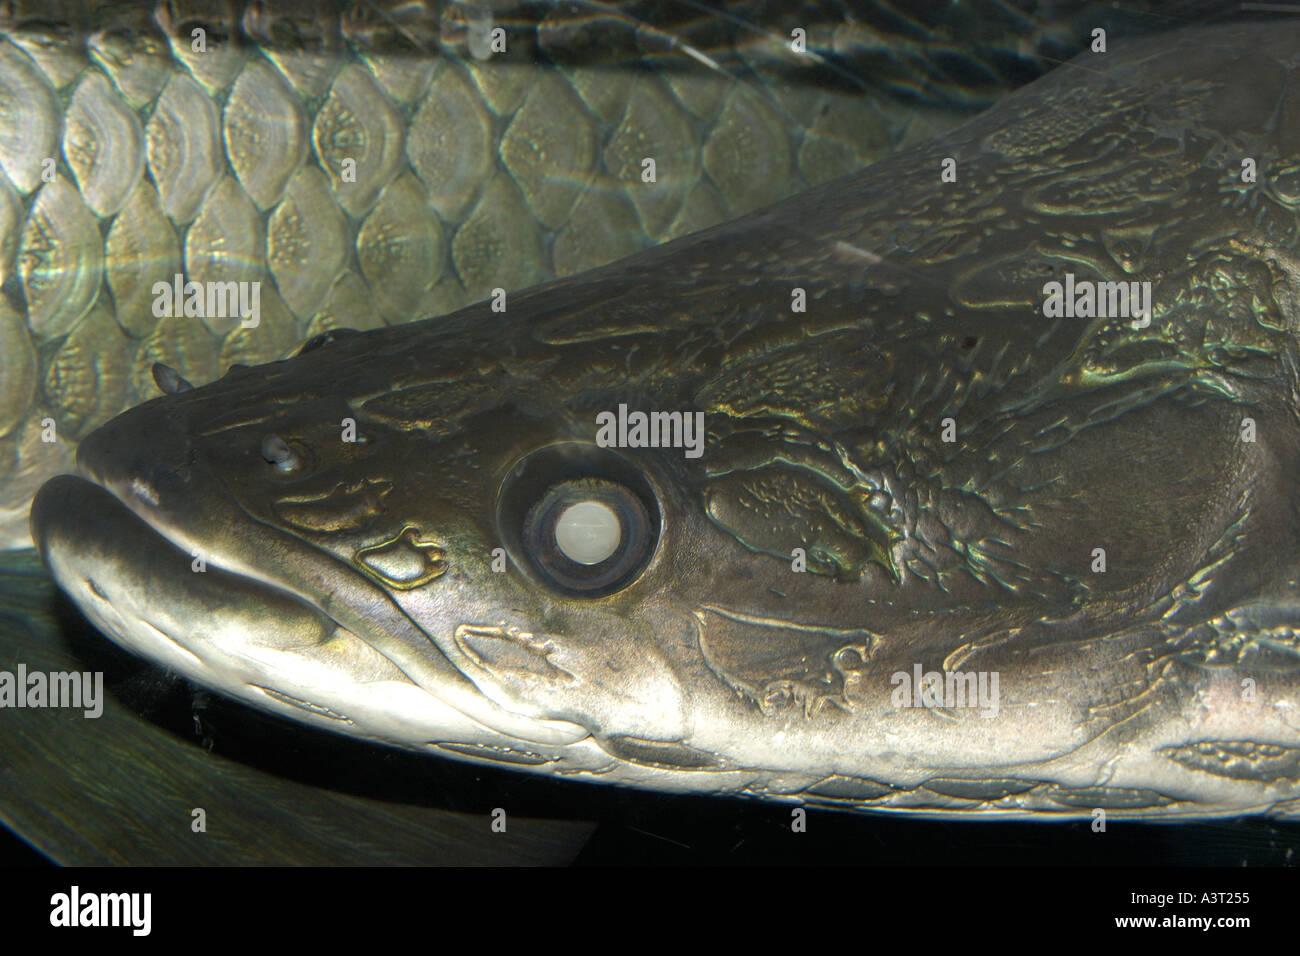 Freshwater fish korea - Arapaima Or Pirarucu Face Detail Arapaima Gigas Largest Freshwater Fish Naturally Occurs In The Amazon River